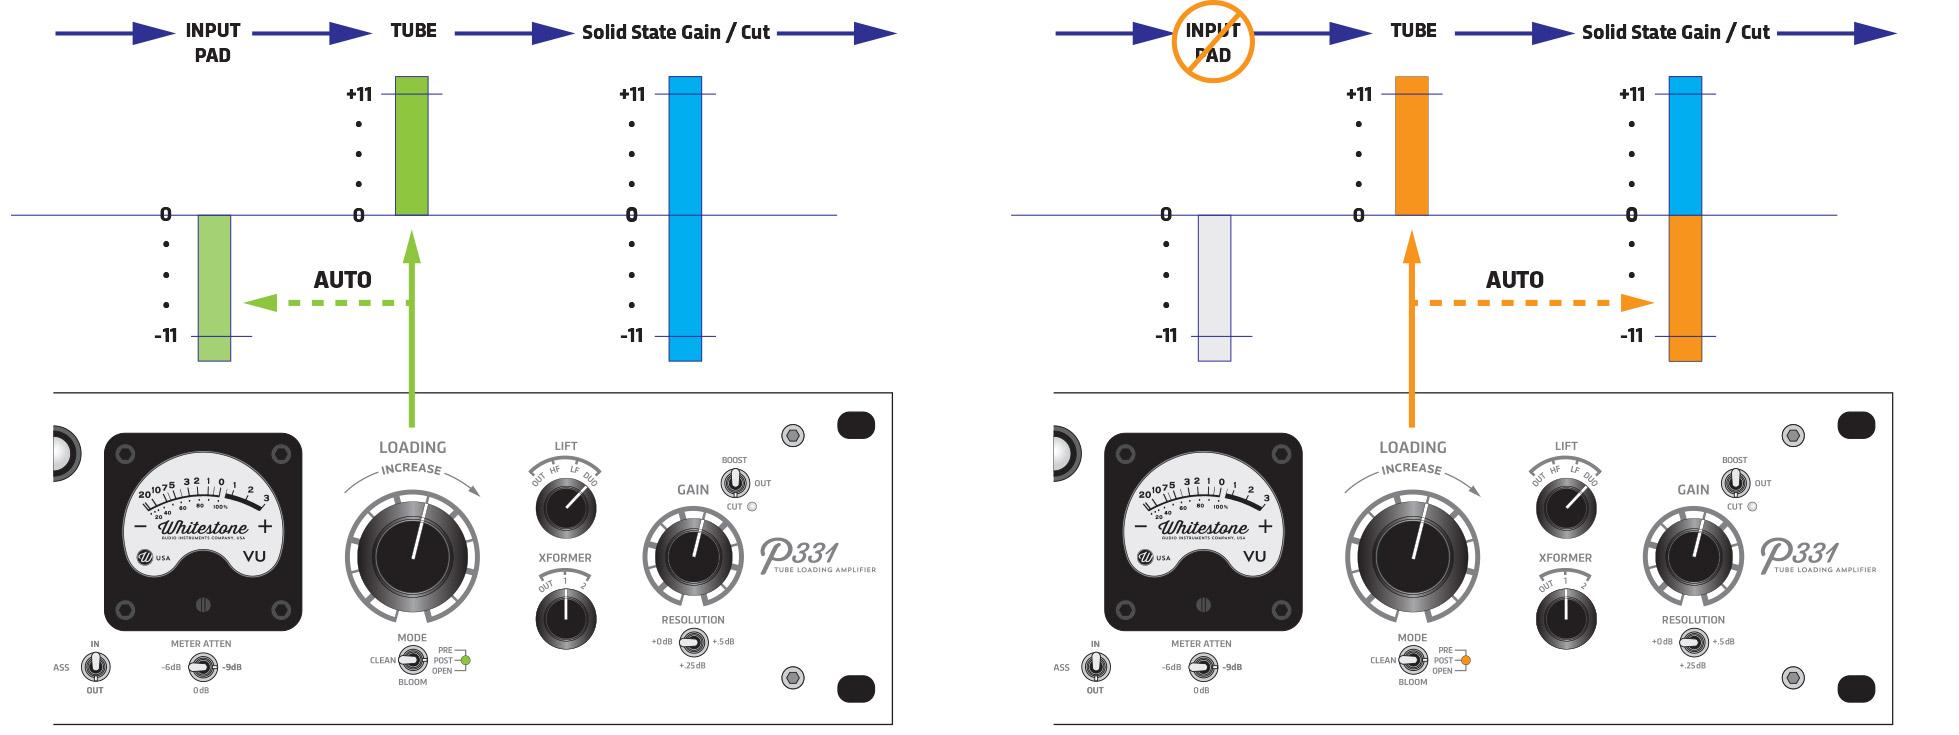 Whitestone® Auto-Padding Diagram